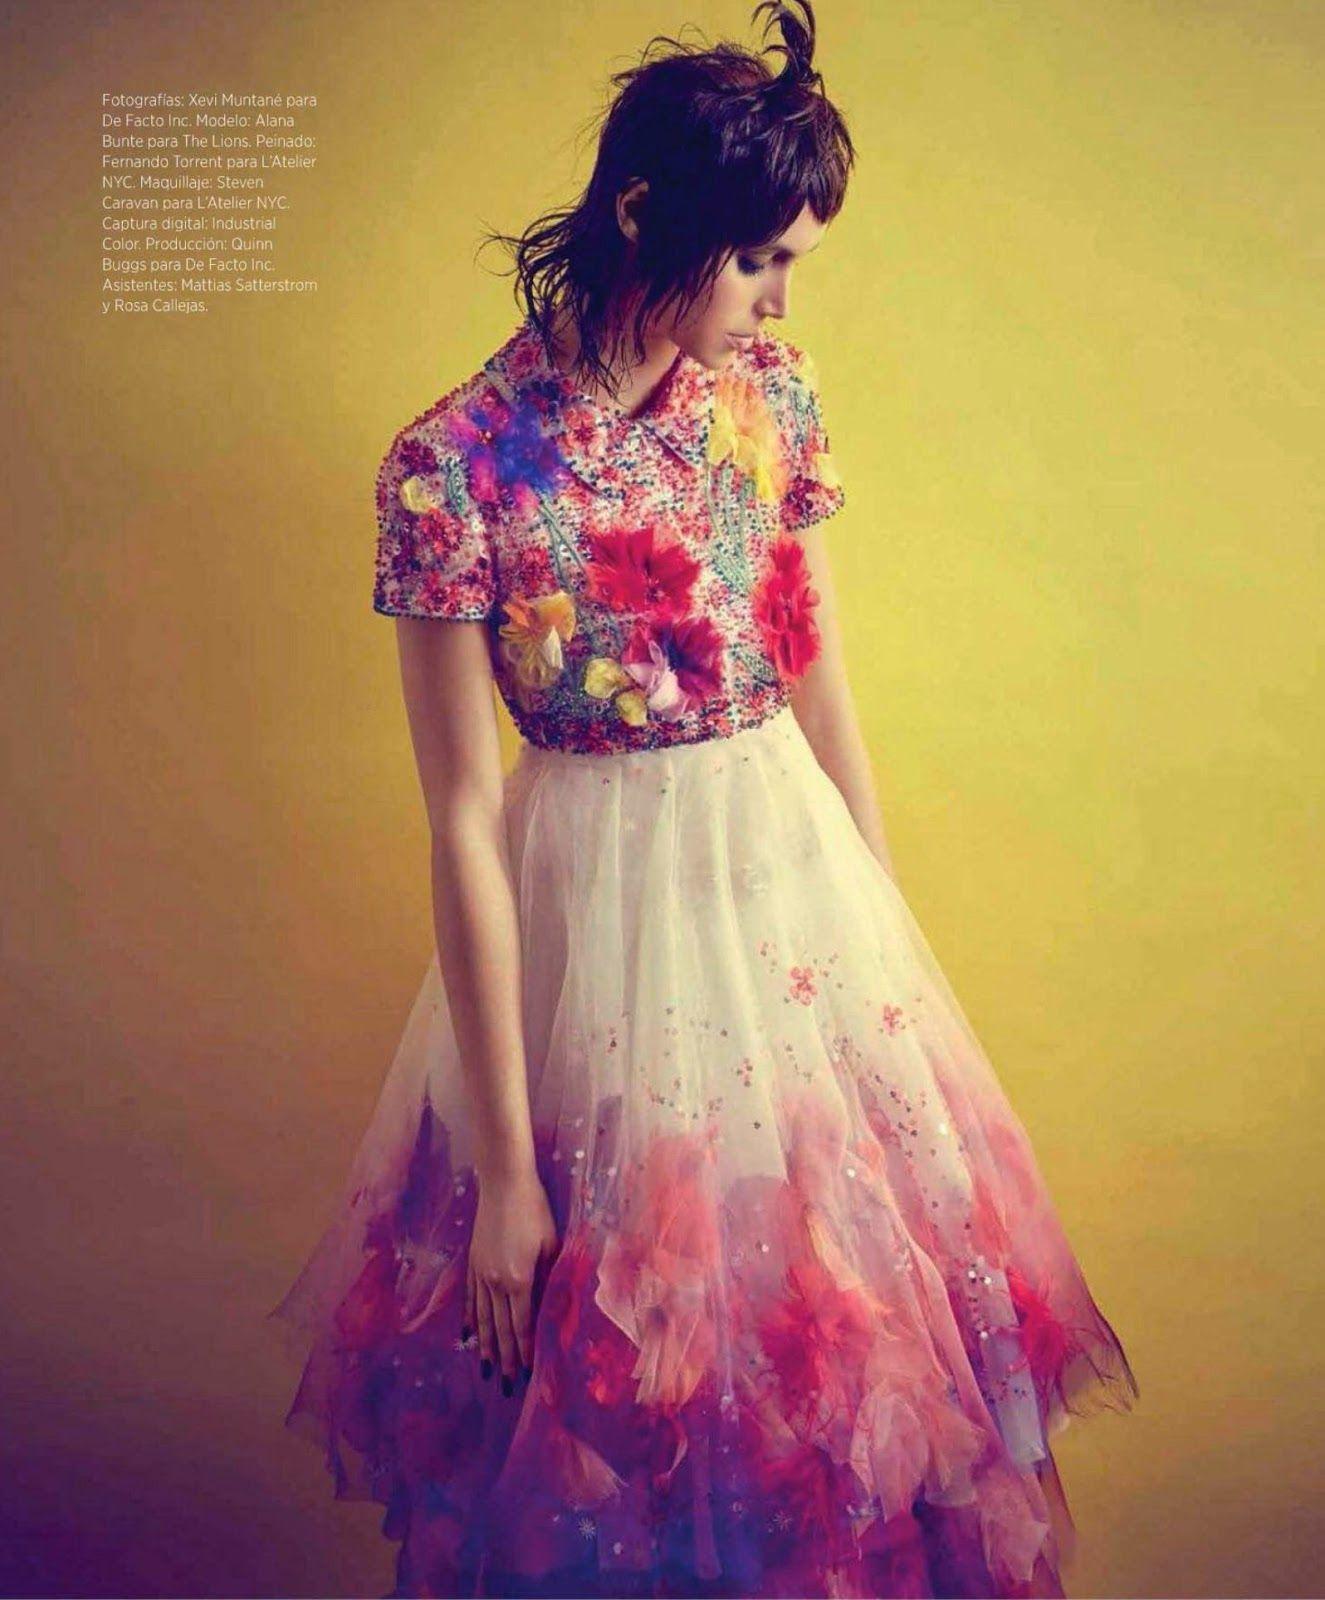 Duchess Dior: Alana Bunte in Chanel Couture for Harper's Bazaar Mexico May 2015